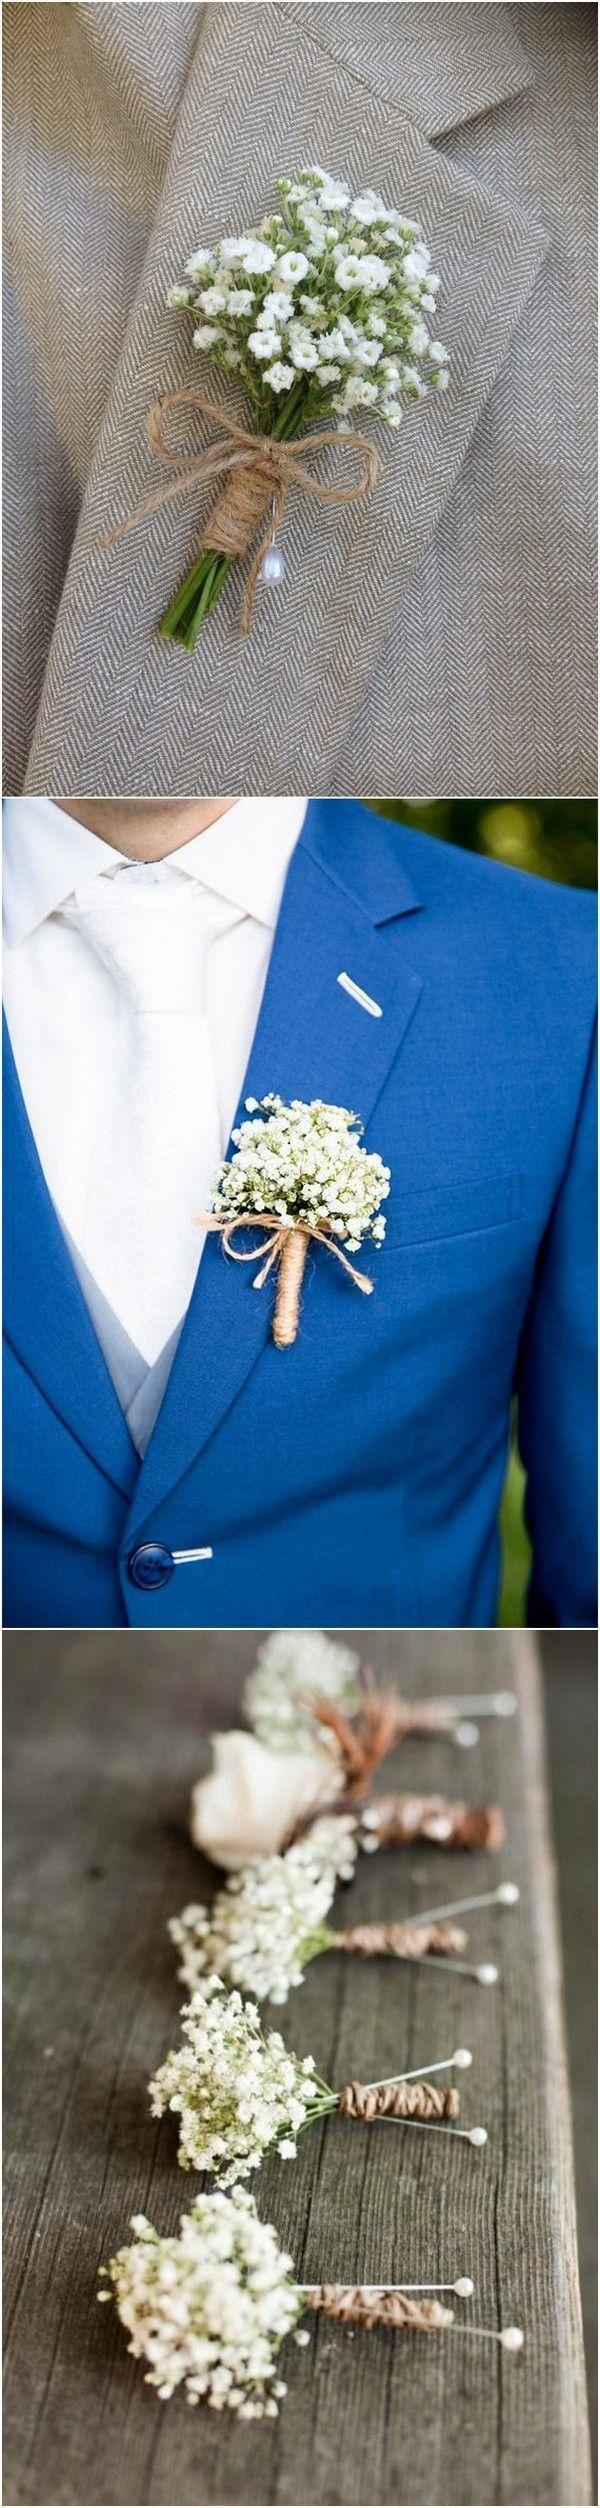 wedding boutonnieres with baby's breath #weddingcandlesdesign